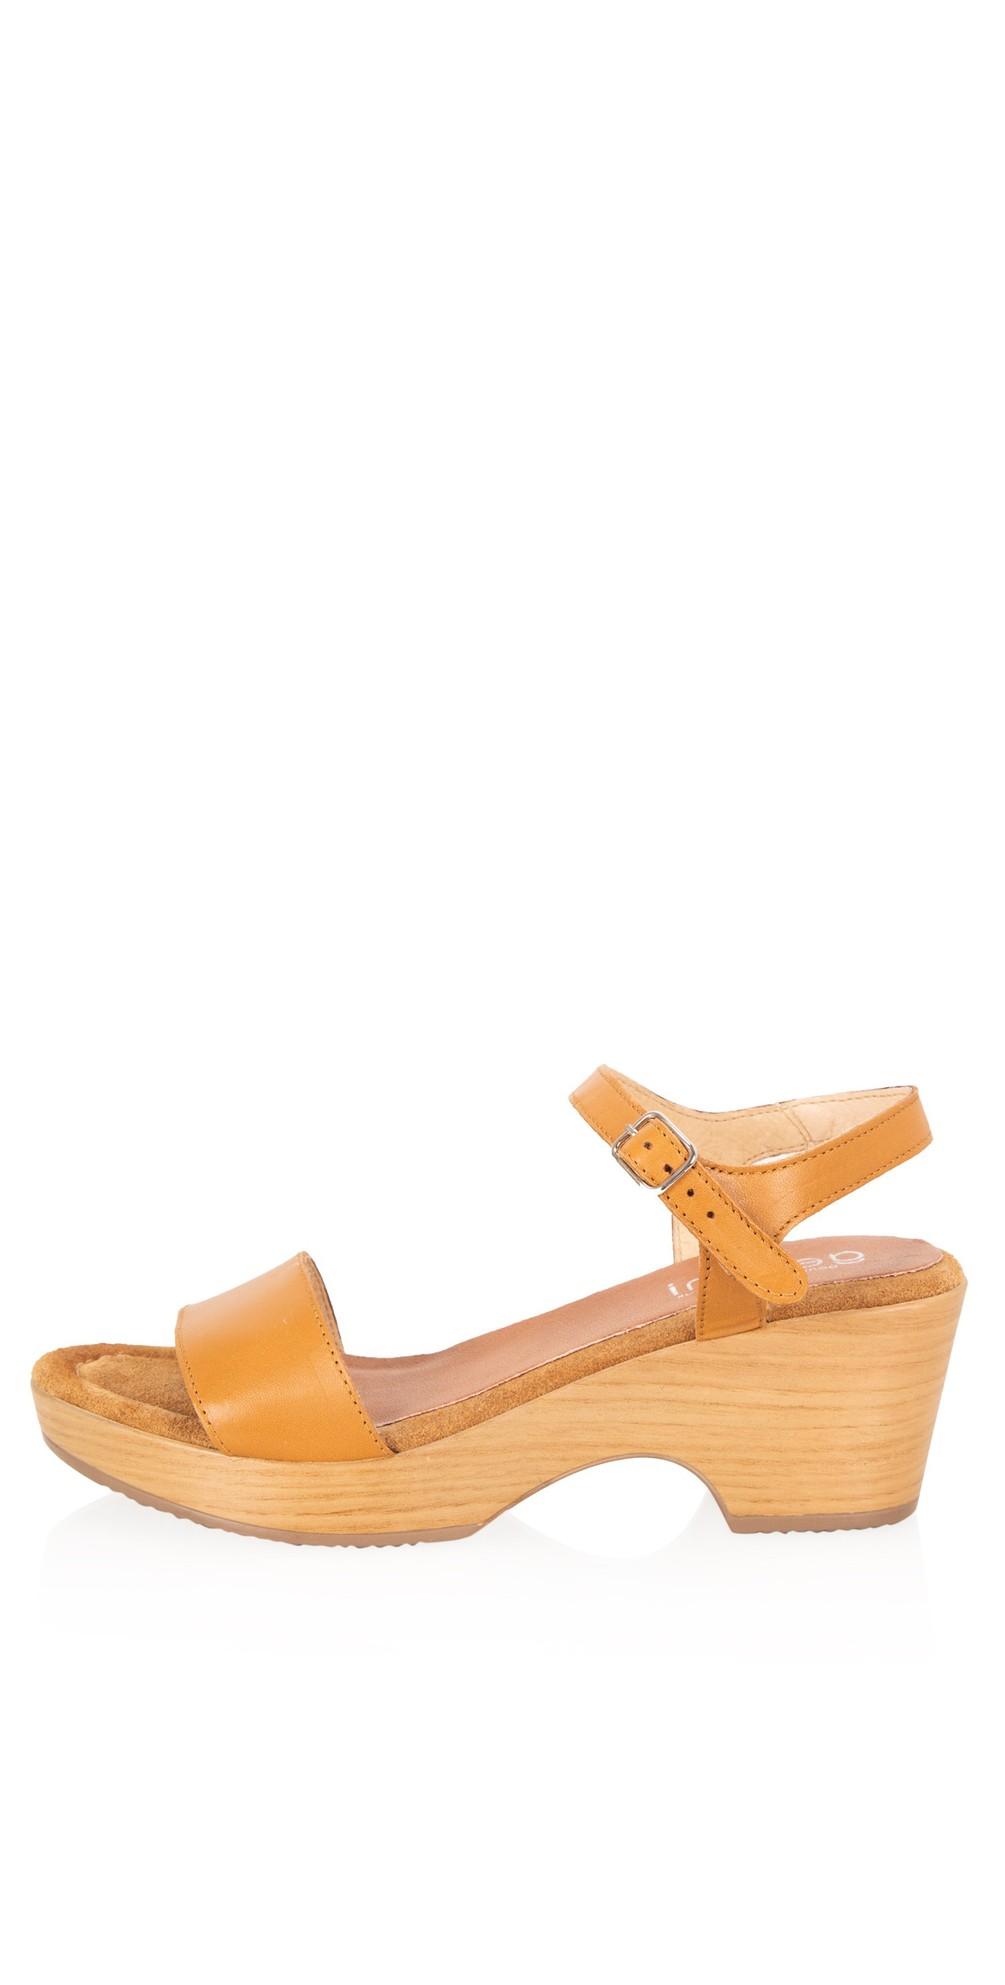 Aneka Icon Tan Leather Wedge Sandal main image